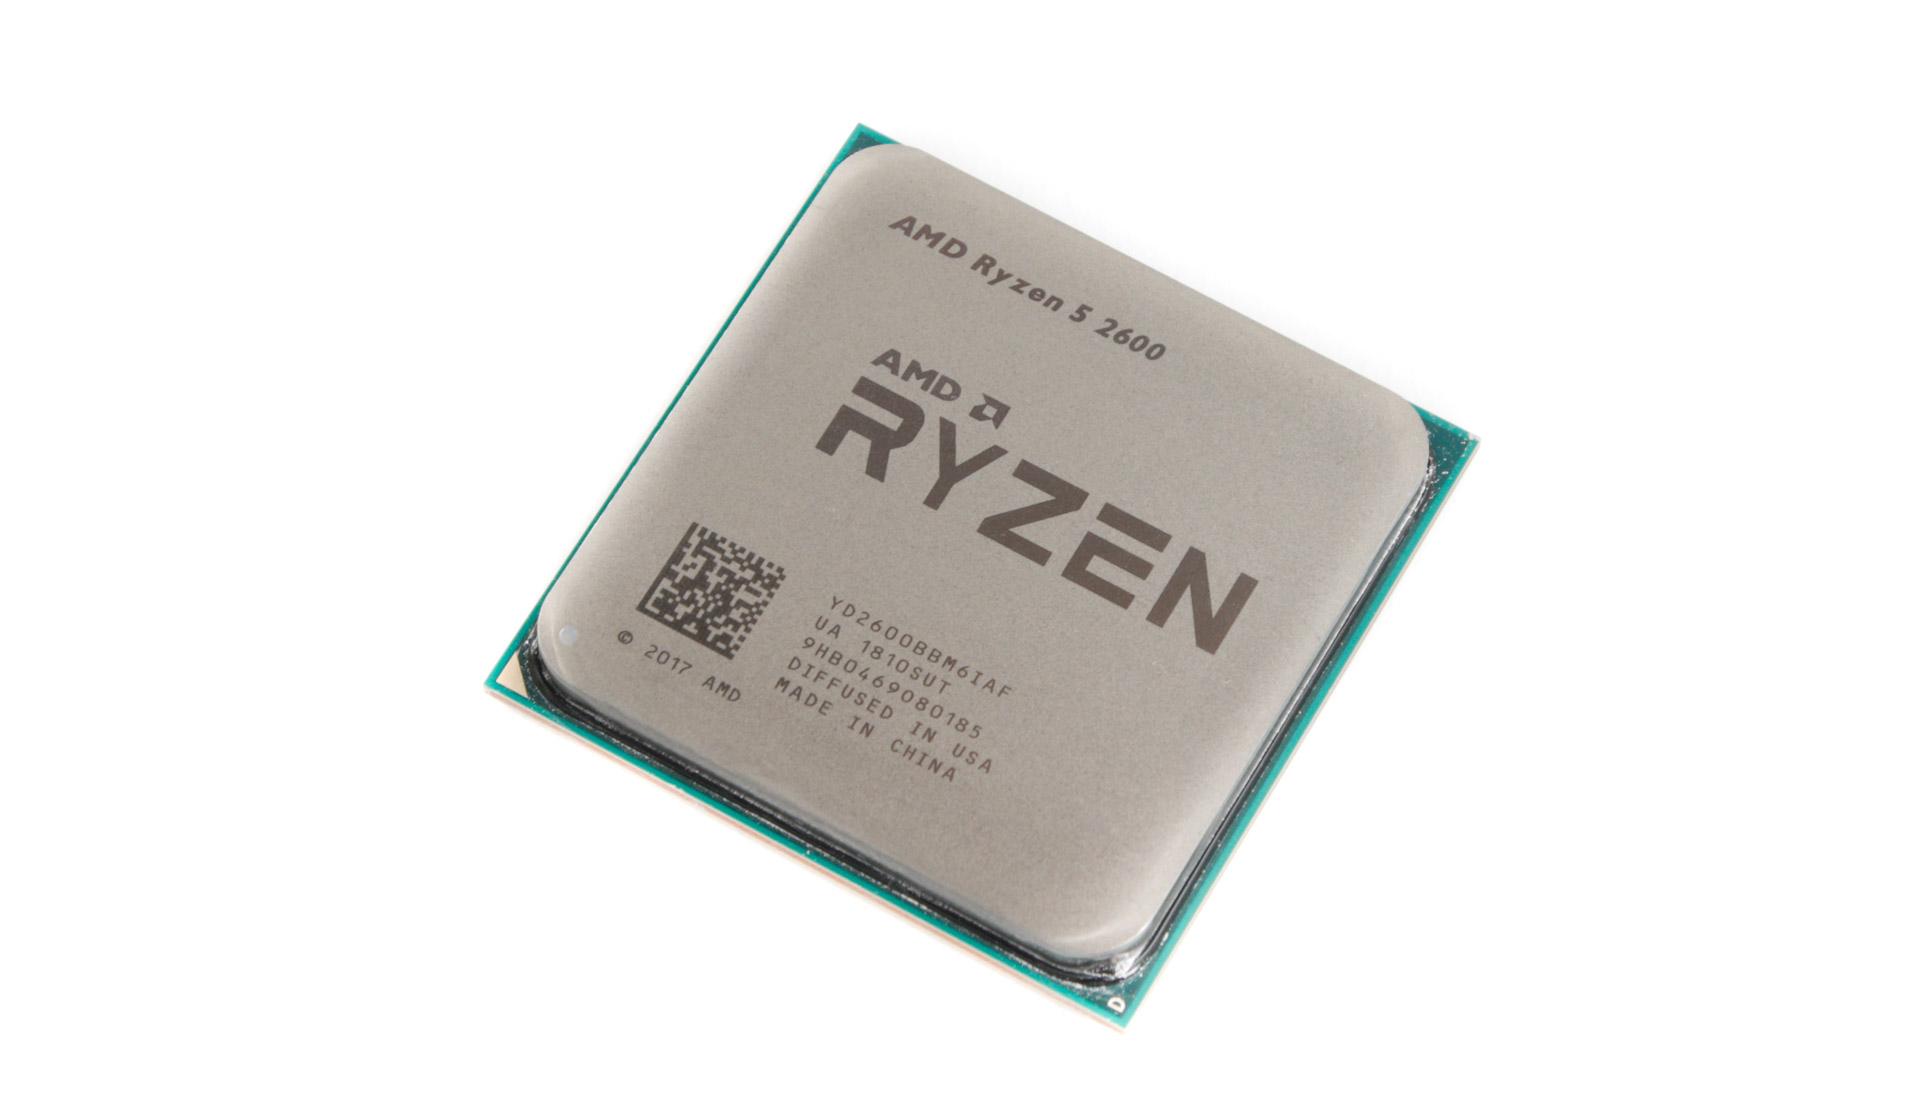 Has AMD made overclocking Ryzen CPUs pointless? | bit-tech net